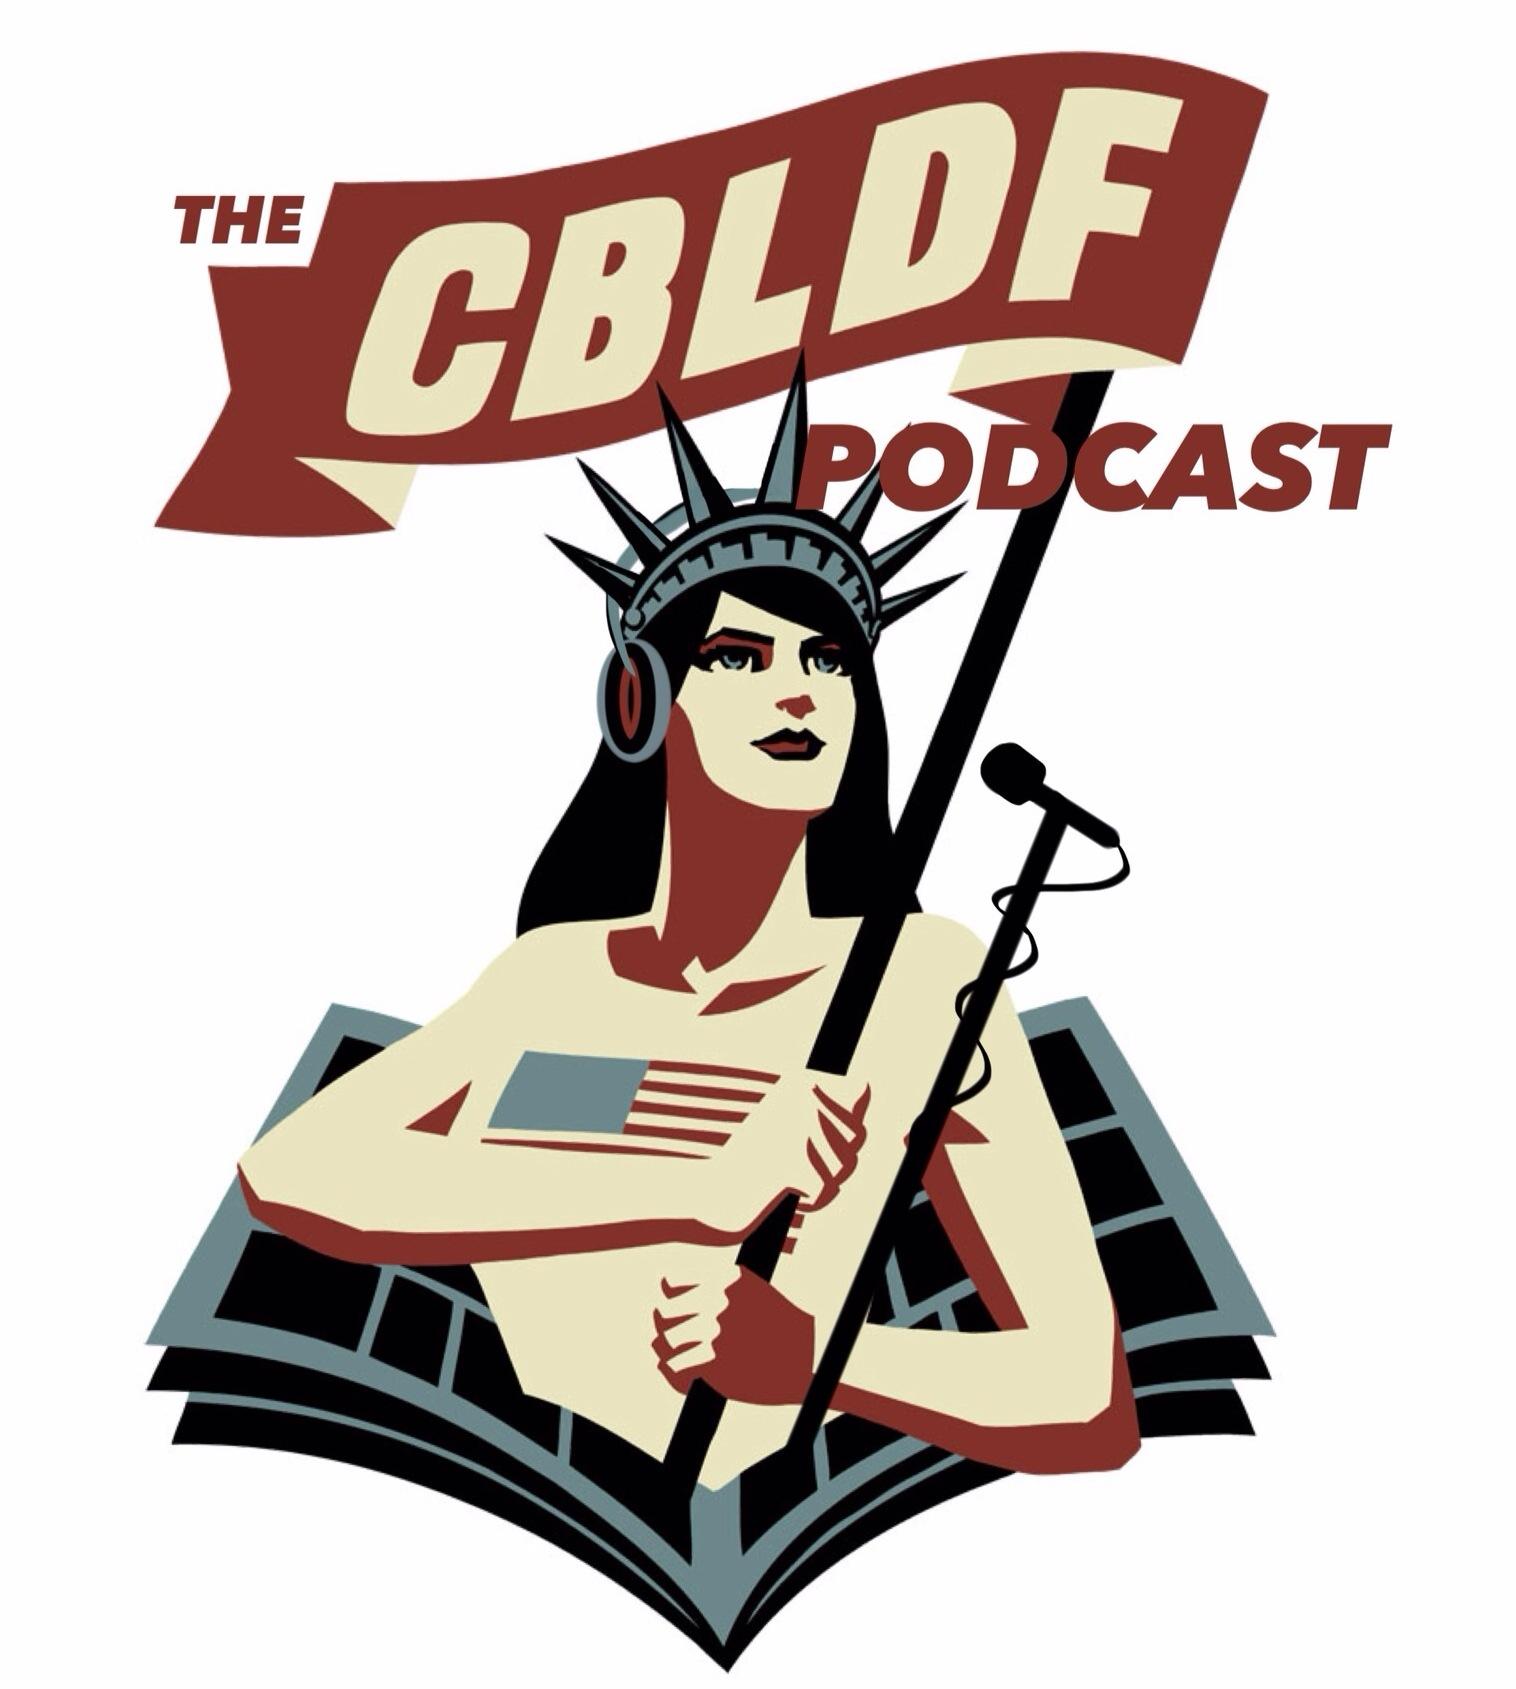 CBLDF Podcast Episode 18: KATIE SKELLY on Crepax, Manara